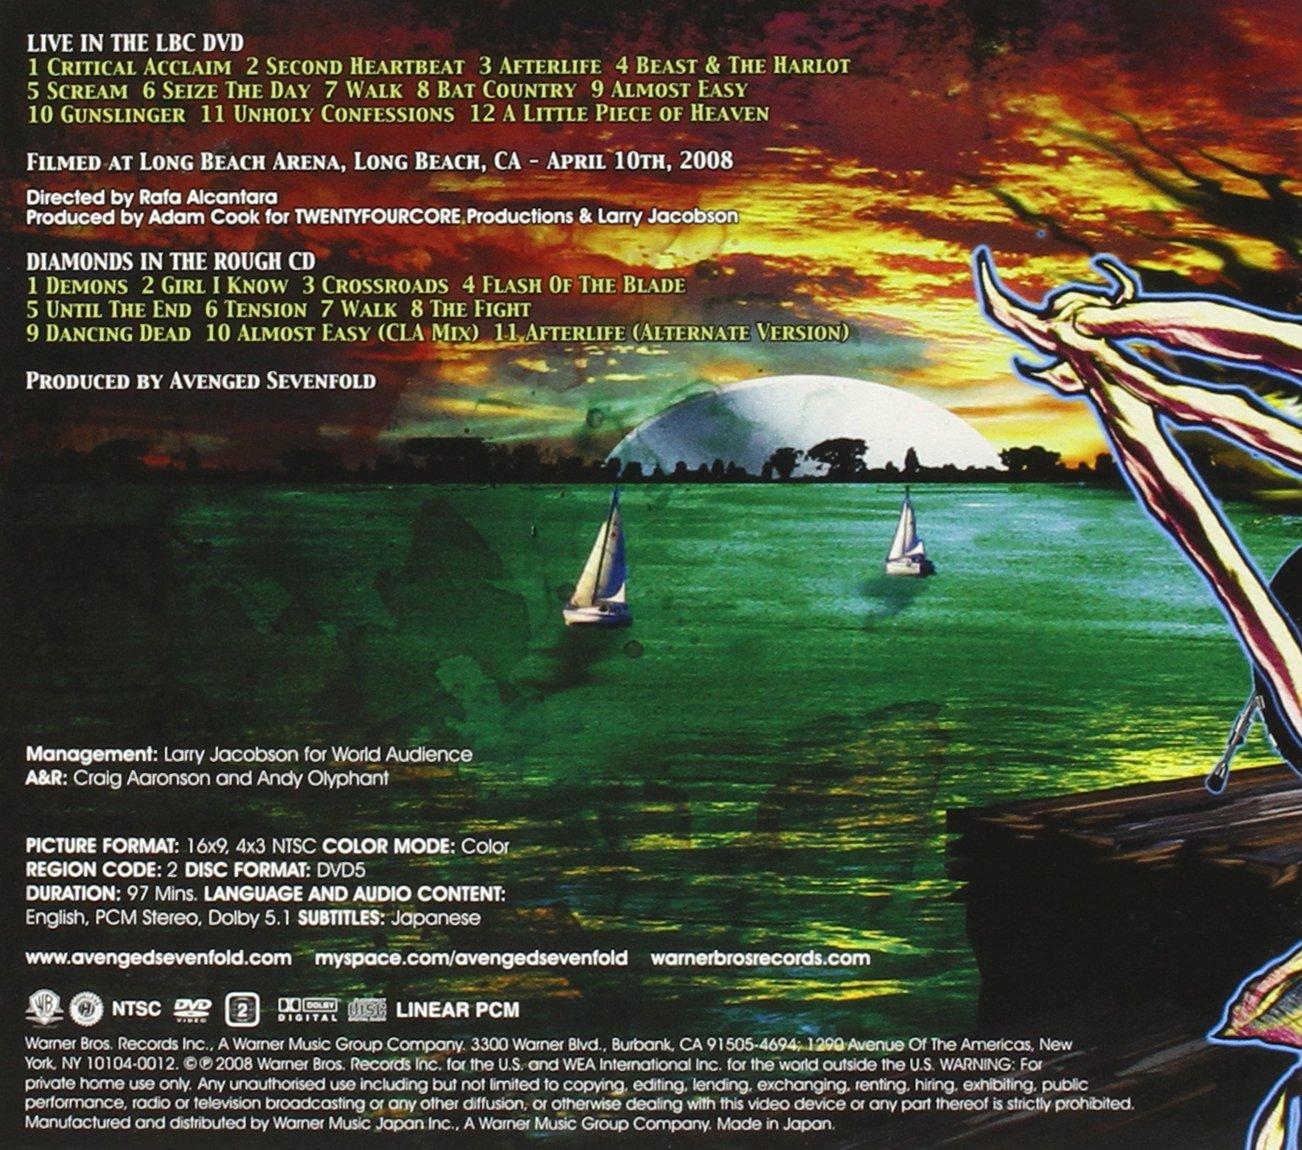 cd do avenged sevenfold live in the lbc